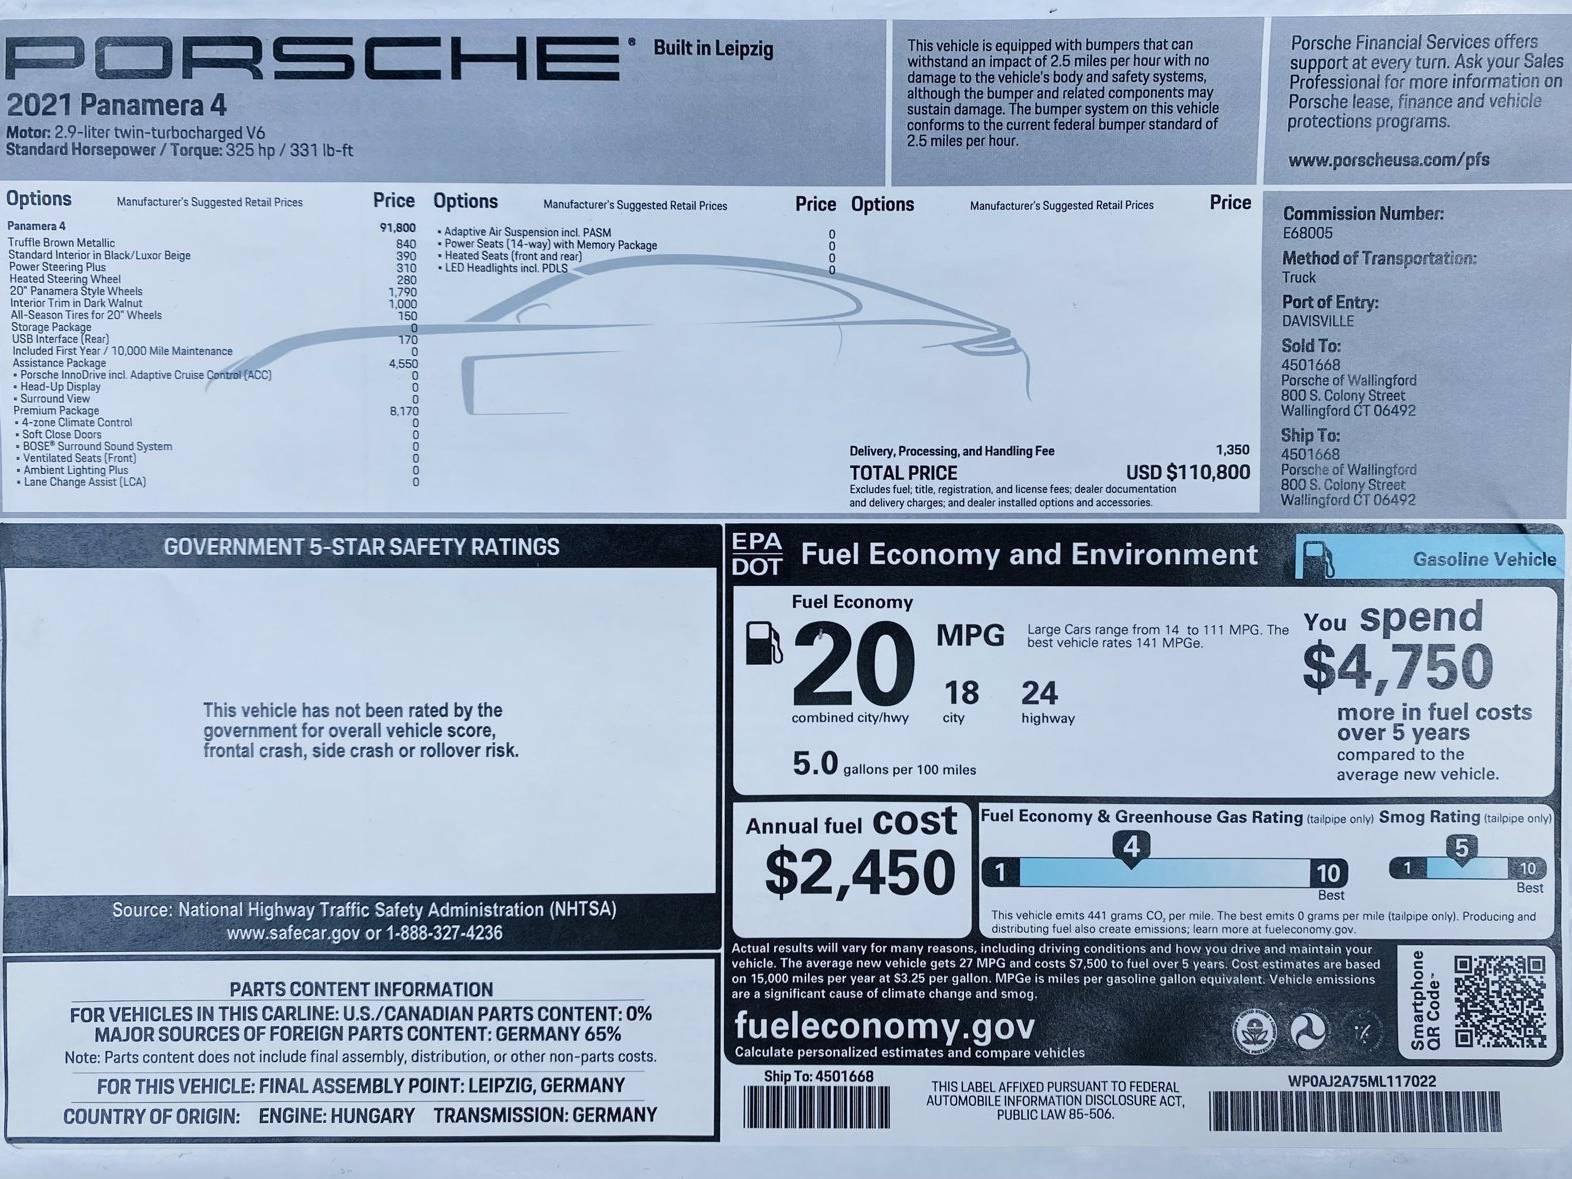 2021 Porsche Panamera 4 – 2